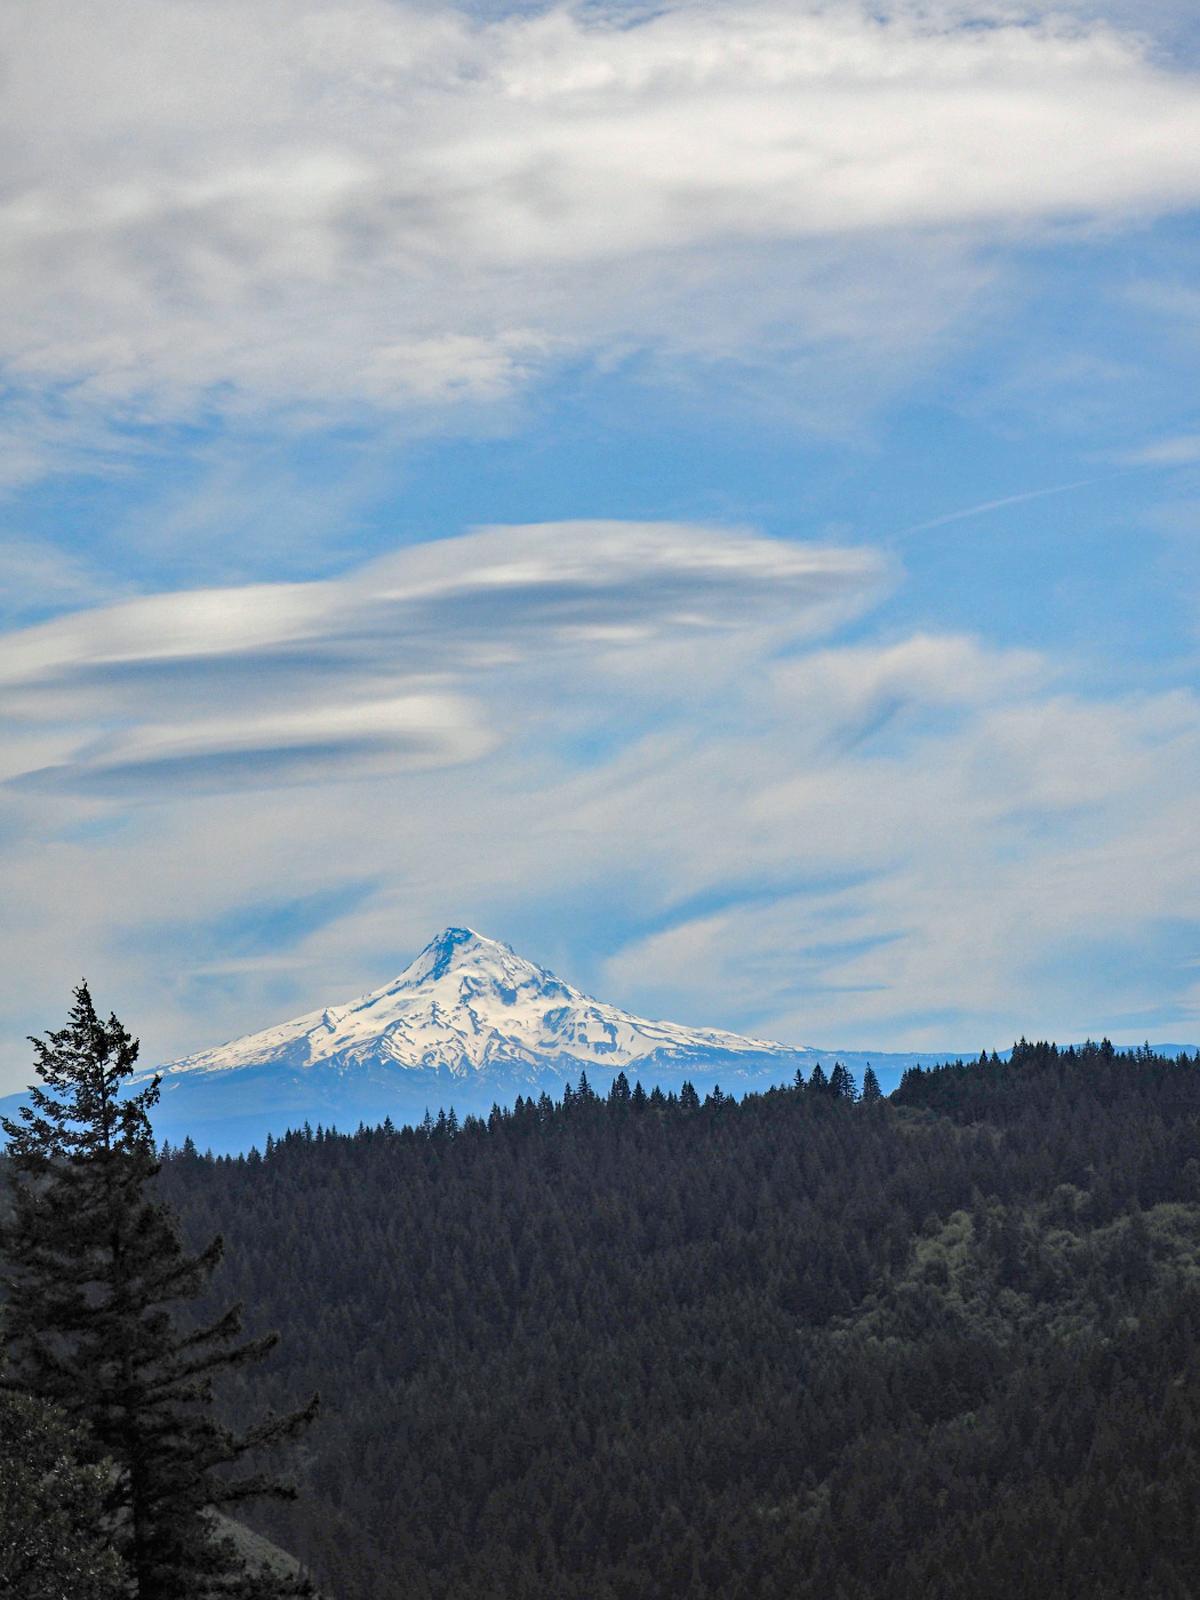 Mt. Hood from the Weldon Wagon Trail